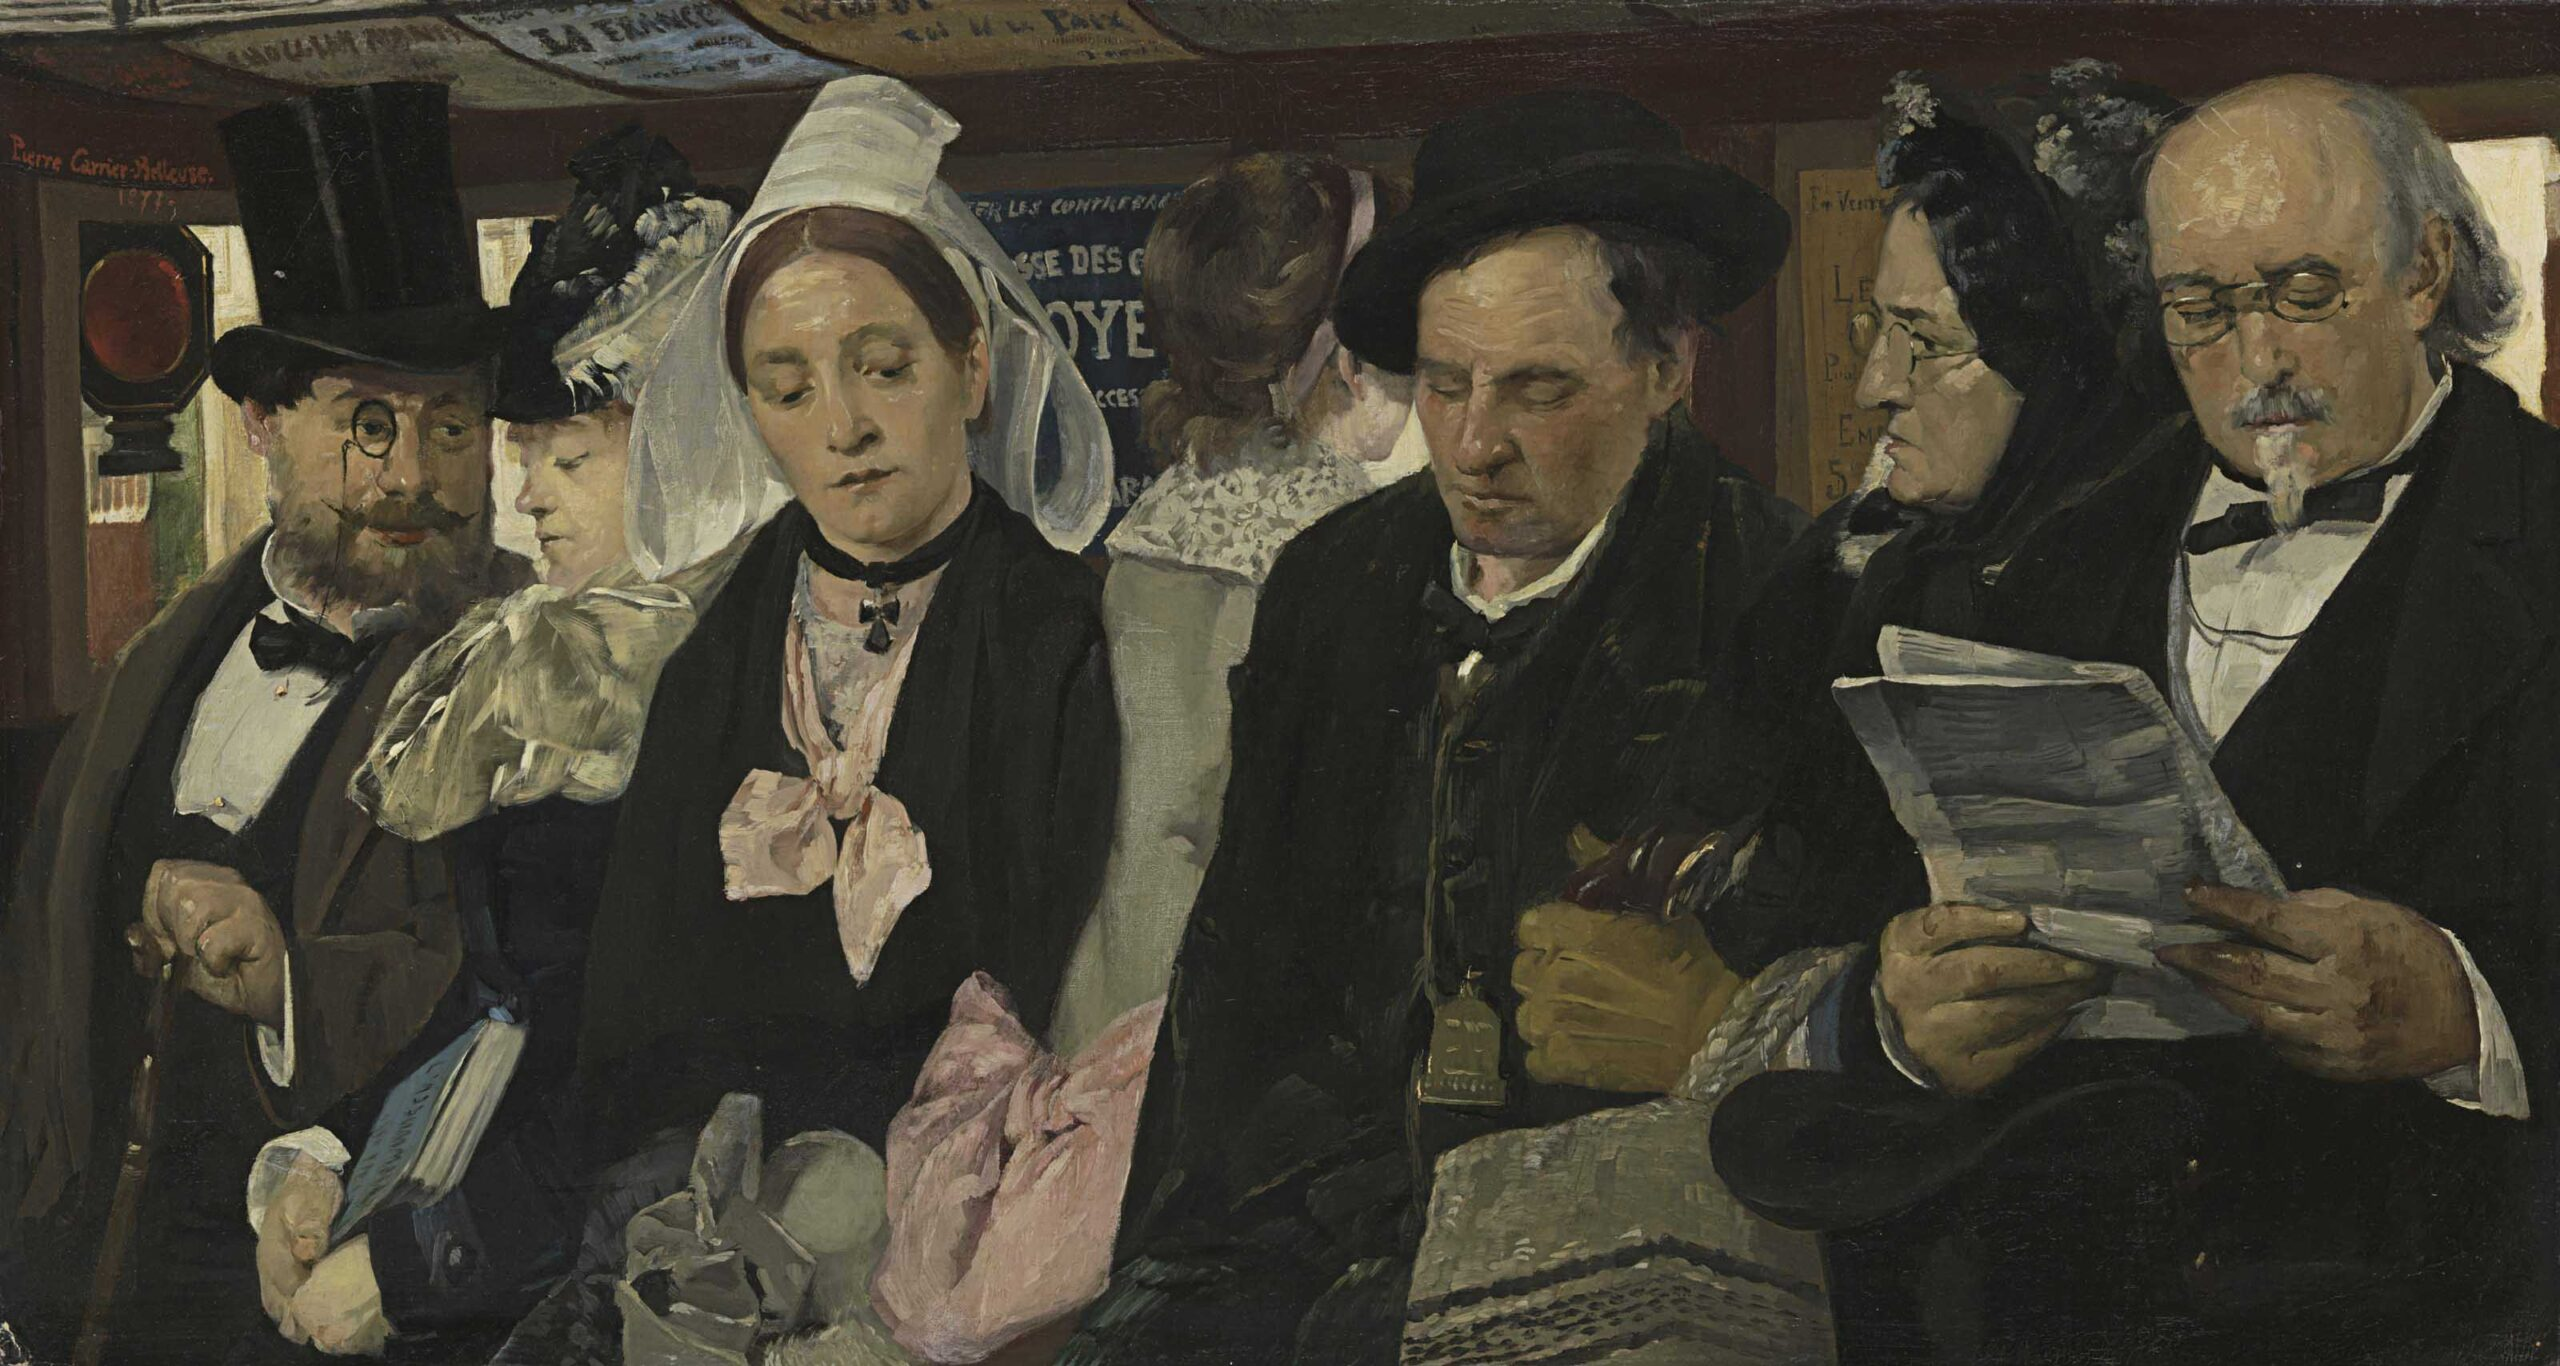 Pierre Carrier-Belleuse 1877 L'Omnibus coll priv